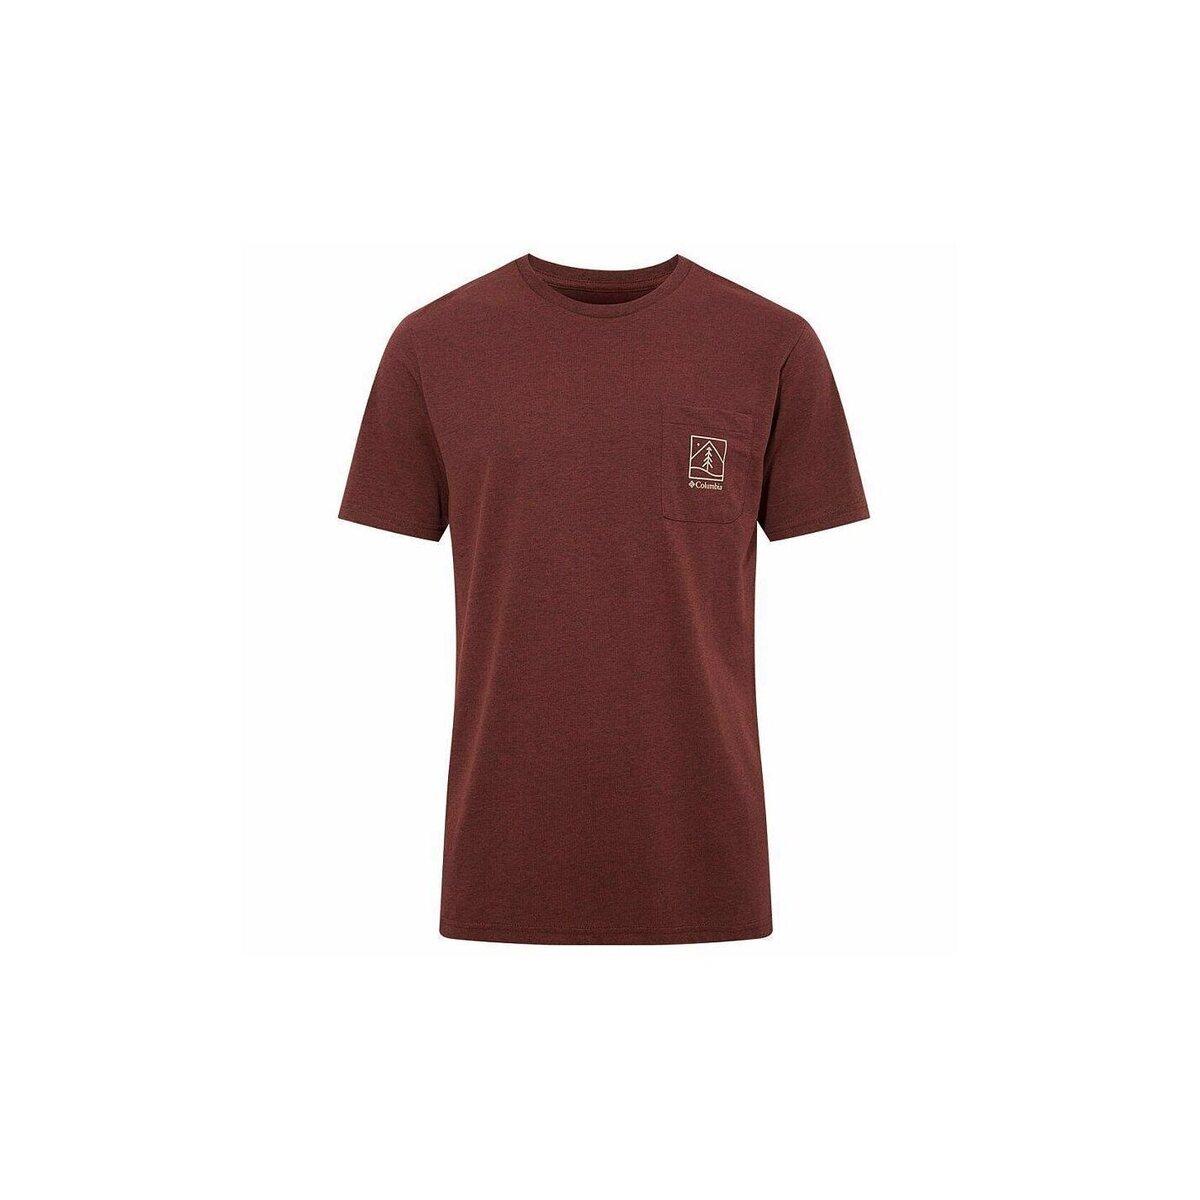 Icon Pocket Erkek Bordo Tişört